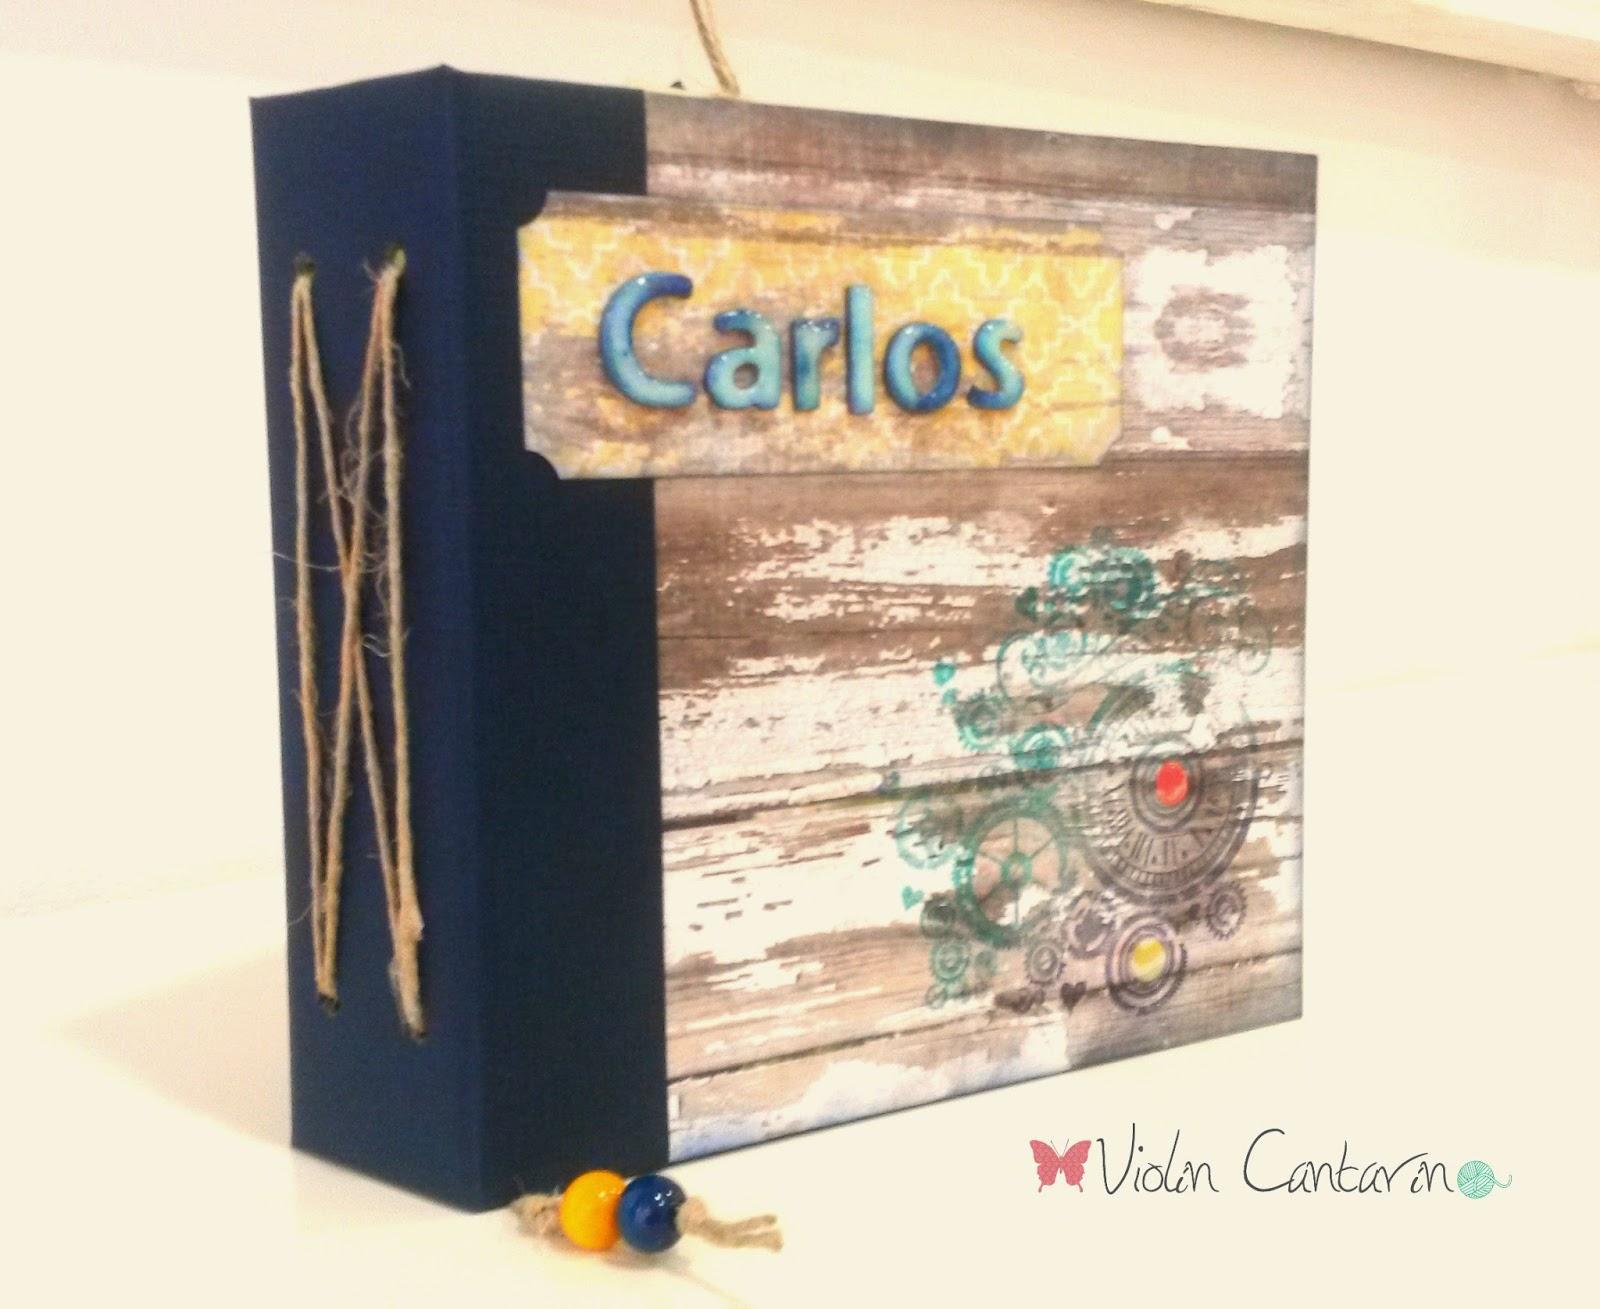 scrapbook, manualidades, álbum, tintas, embossing, Violín Cantarín